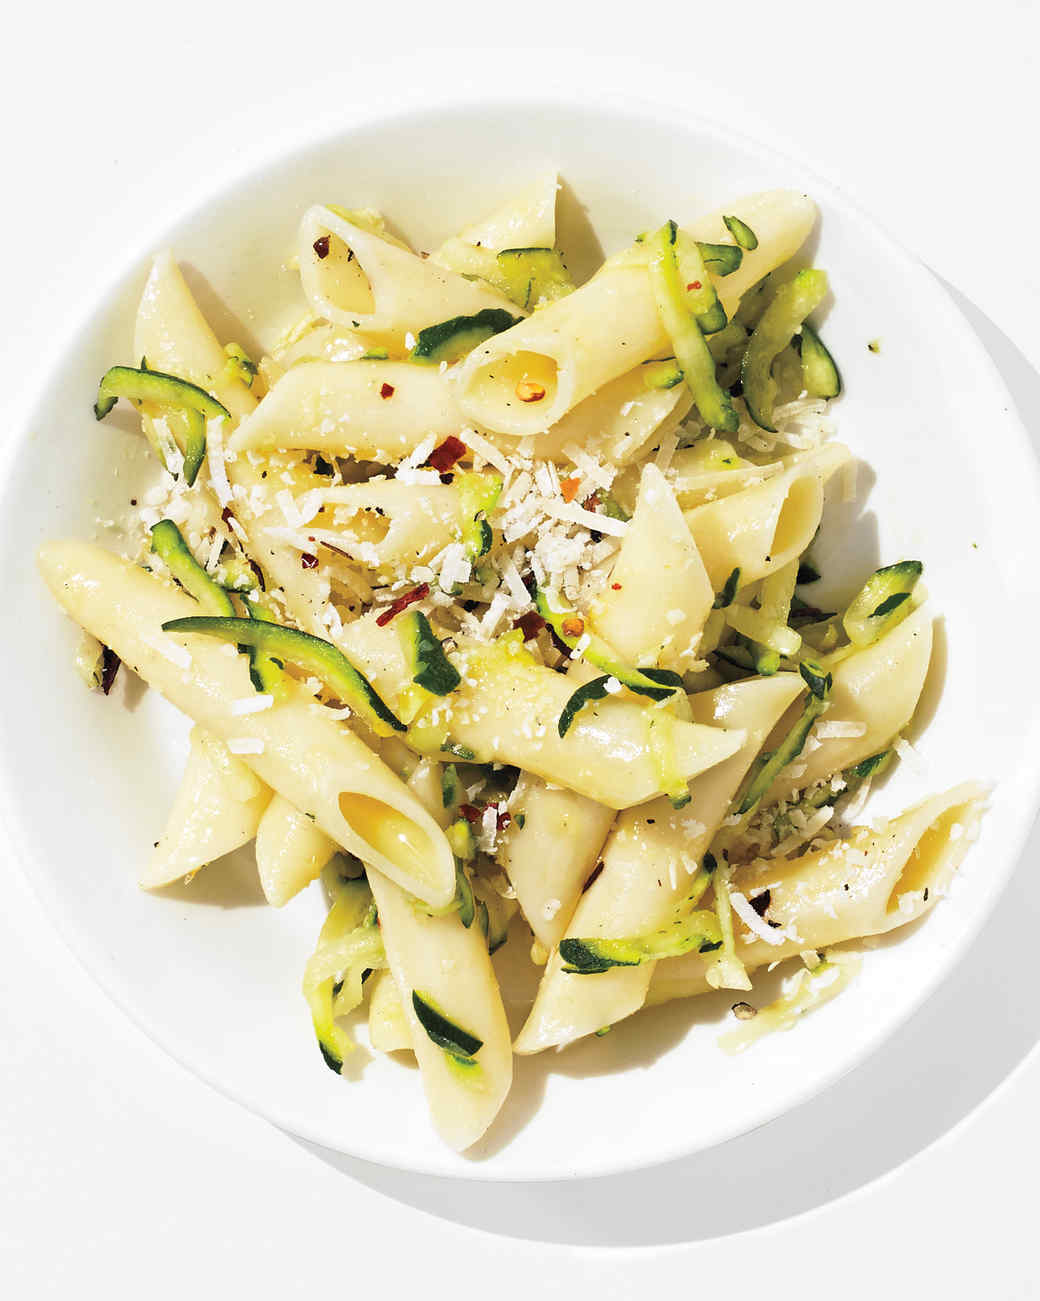 zucchini-pasta-046-d112023.jpg